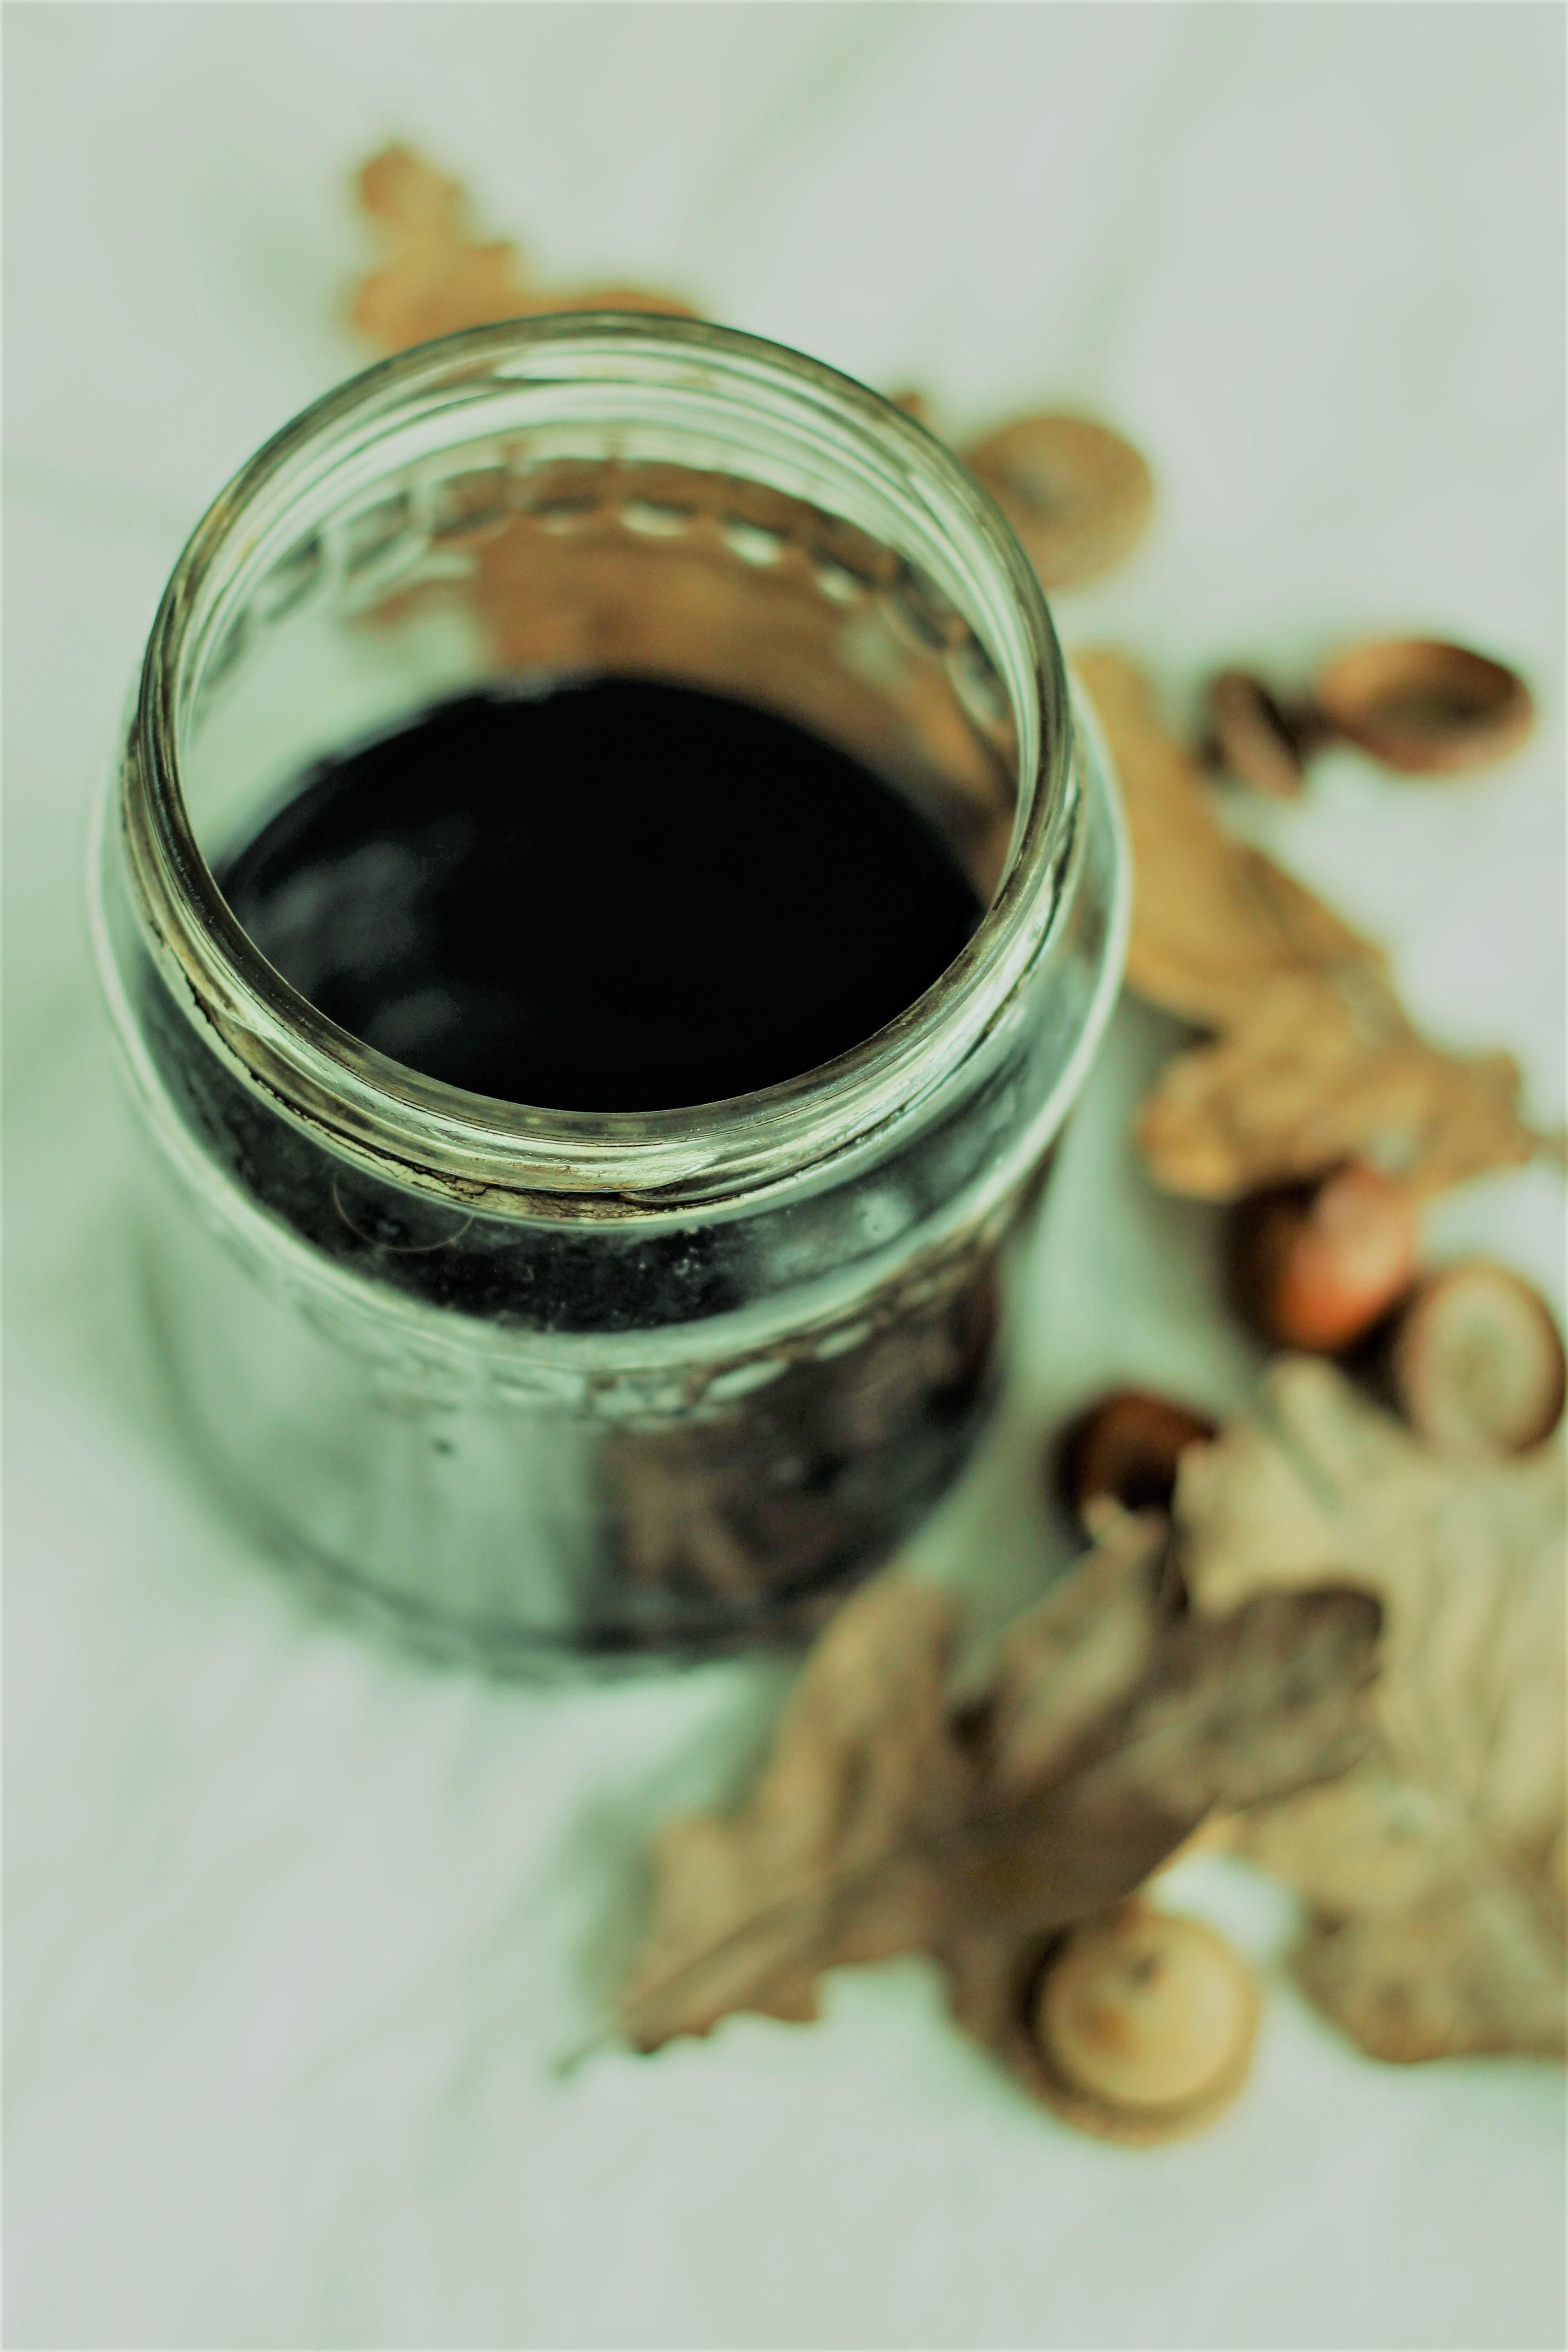 claudialeclercq-dusoleildanslenord-naturaldyeing-tintesnaturales-ironwater-solalnorte-12 (2)